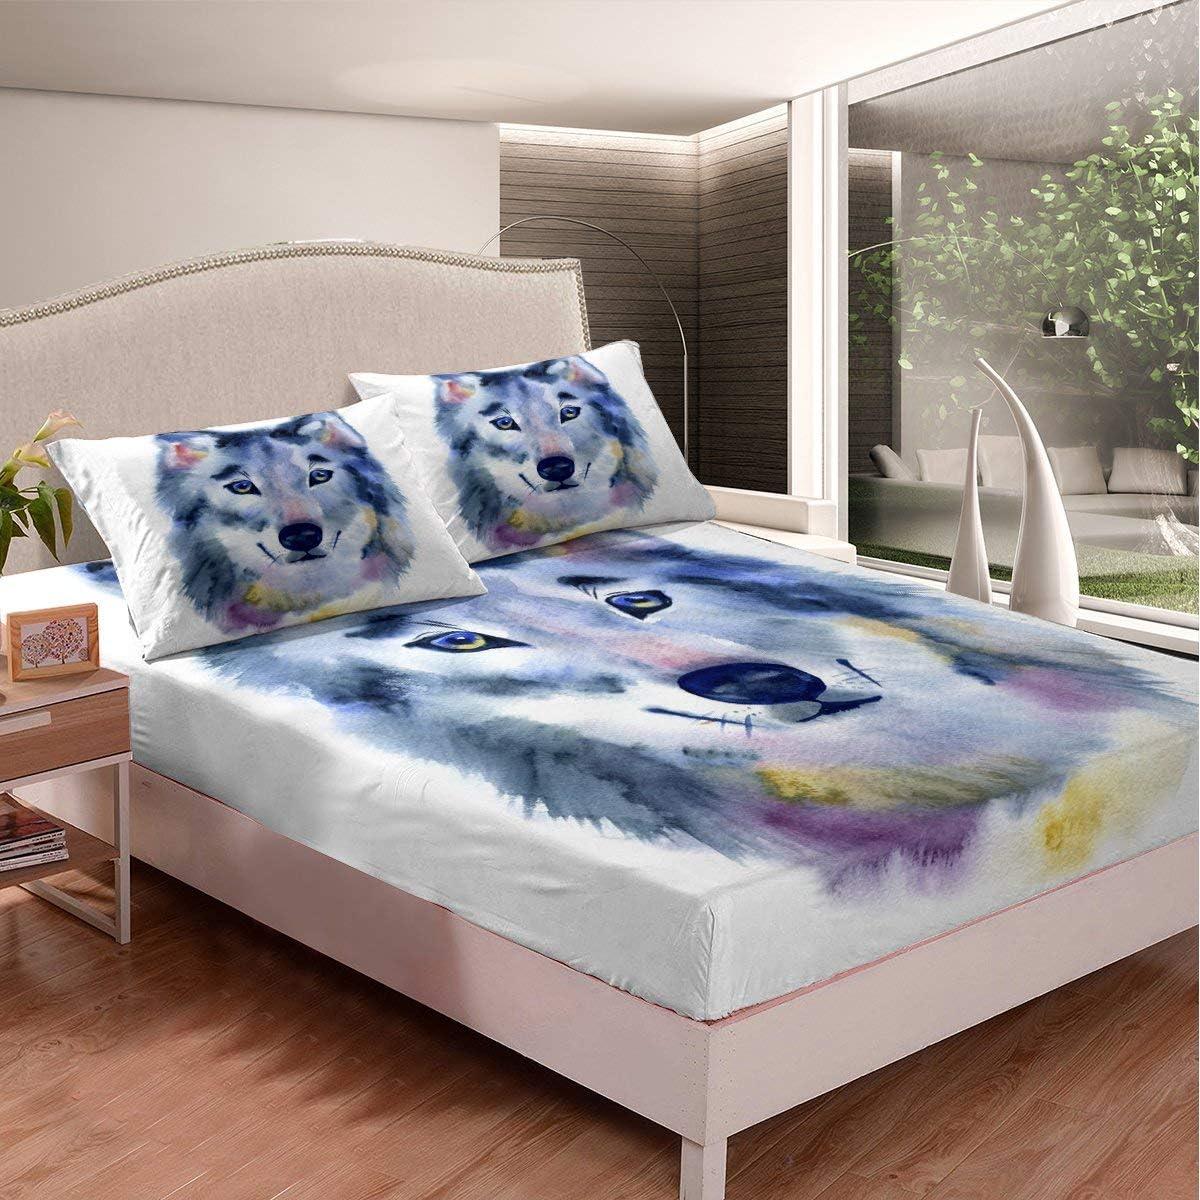 Erosebridal Wolf Fitted Sheet Tie 豪華な Bed Be Gray 本日の目玉 Set Dye